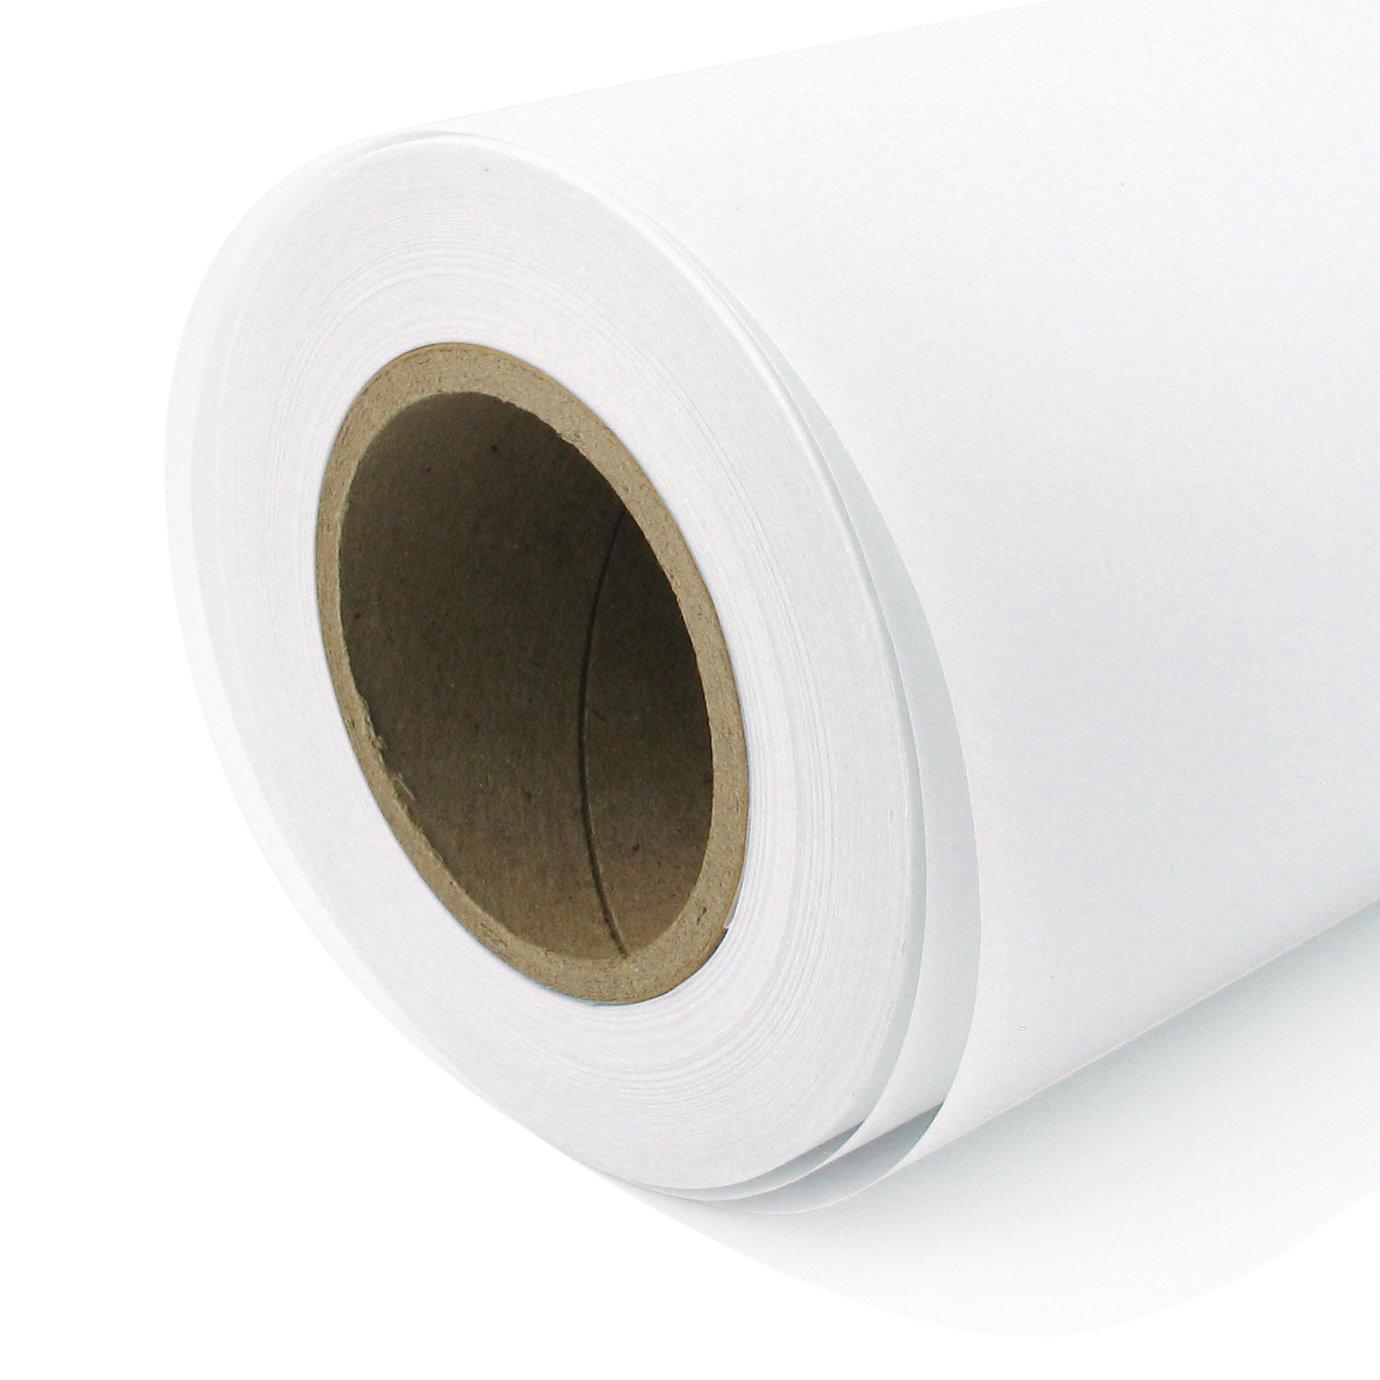 Carta di costruzione abbozza ruolo carta lucida carta da lucido A2 A3 73g / m² 45 centimetri x 70m Kultloggen